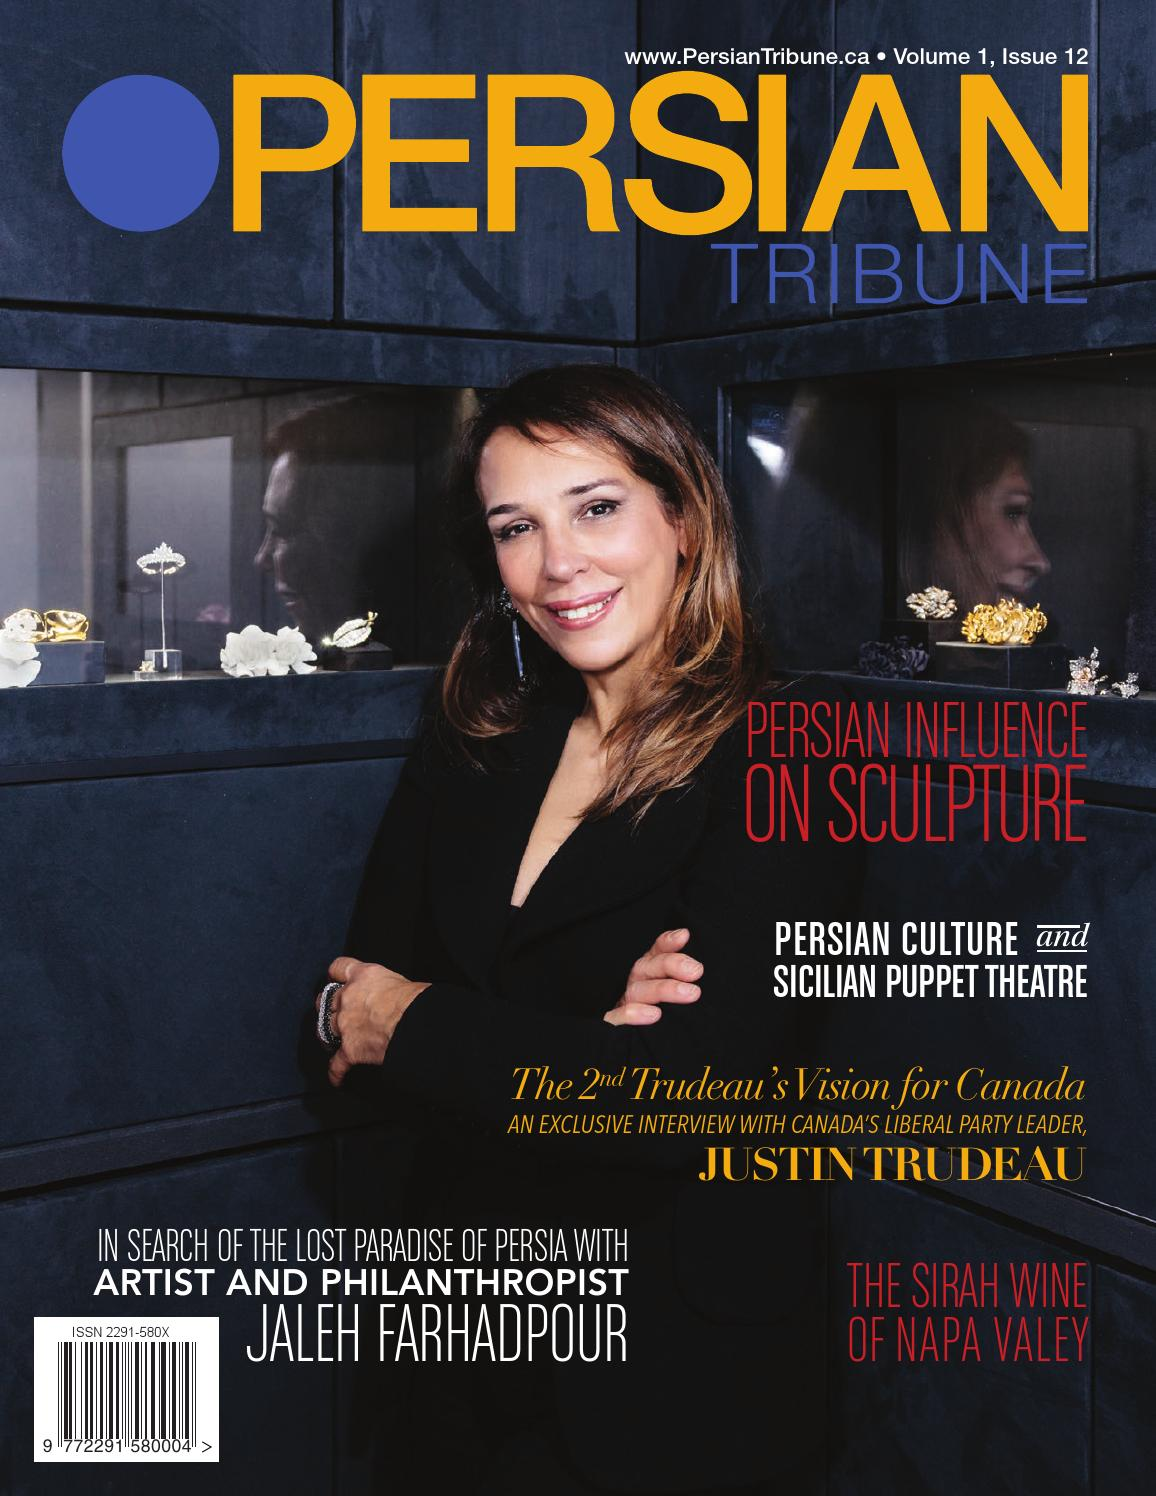 PERSIAN TRIBUNE Volume 1, Issue 12 by Persian Tribune - Issuu